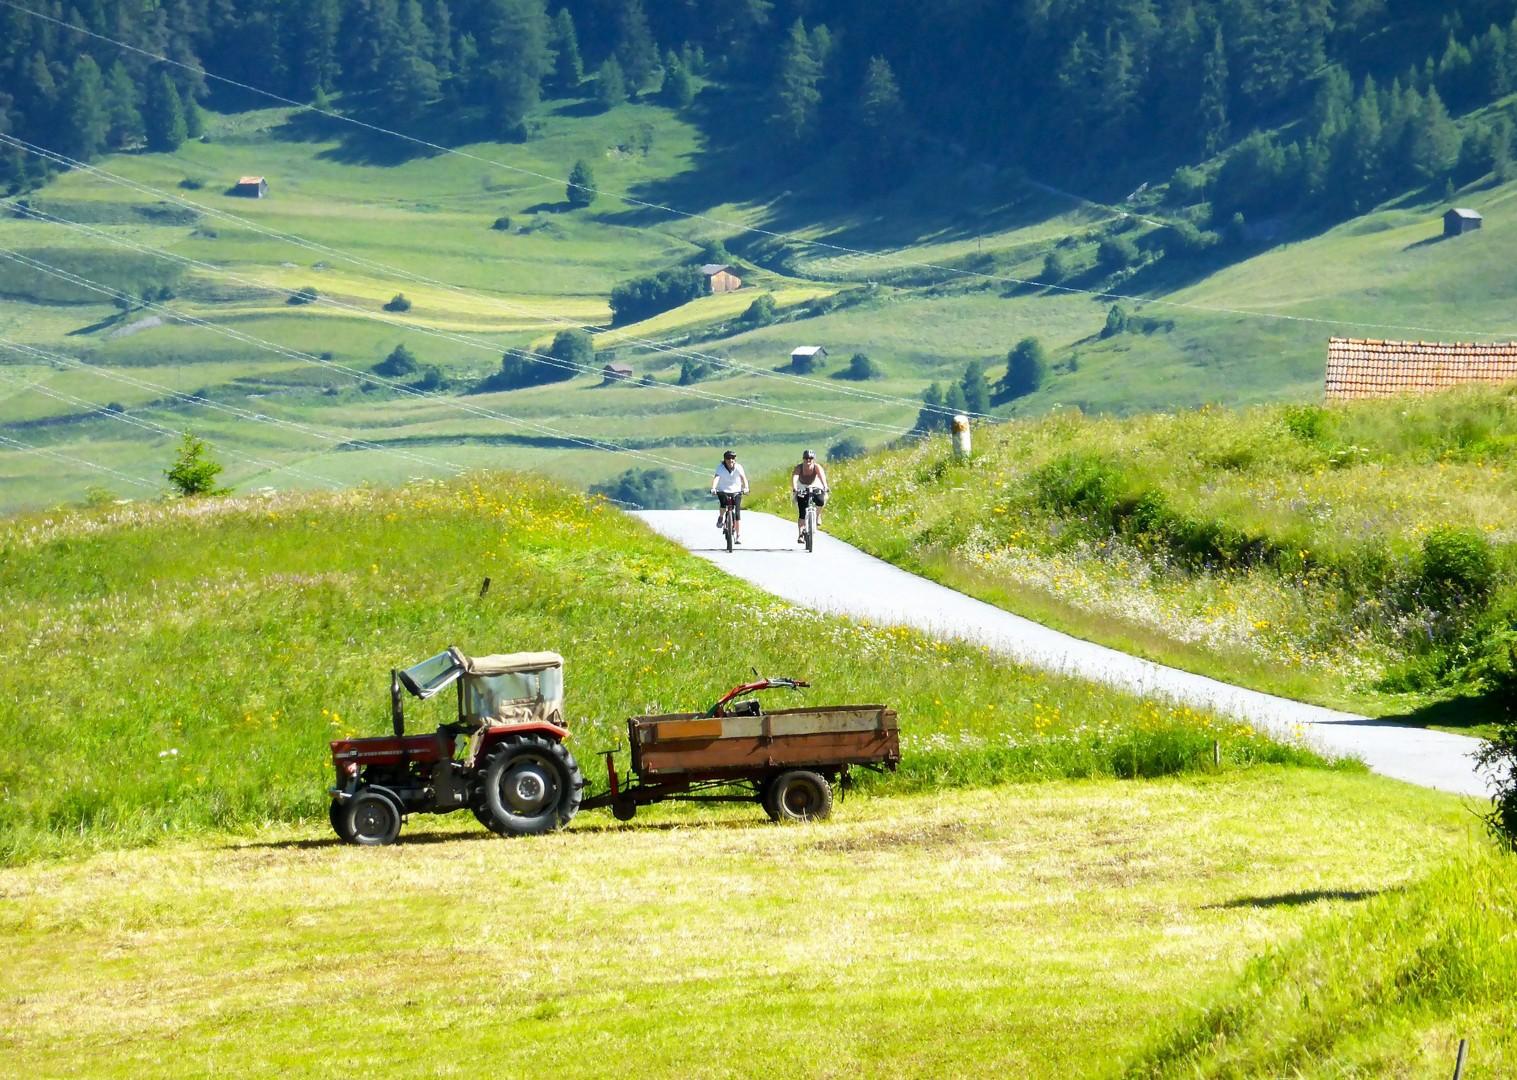 _Holiday.545.19526.jpg - Austria - Ten Lakes Tour - Self-Guided Leisure Cycling Holiday - Leisure Cycling